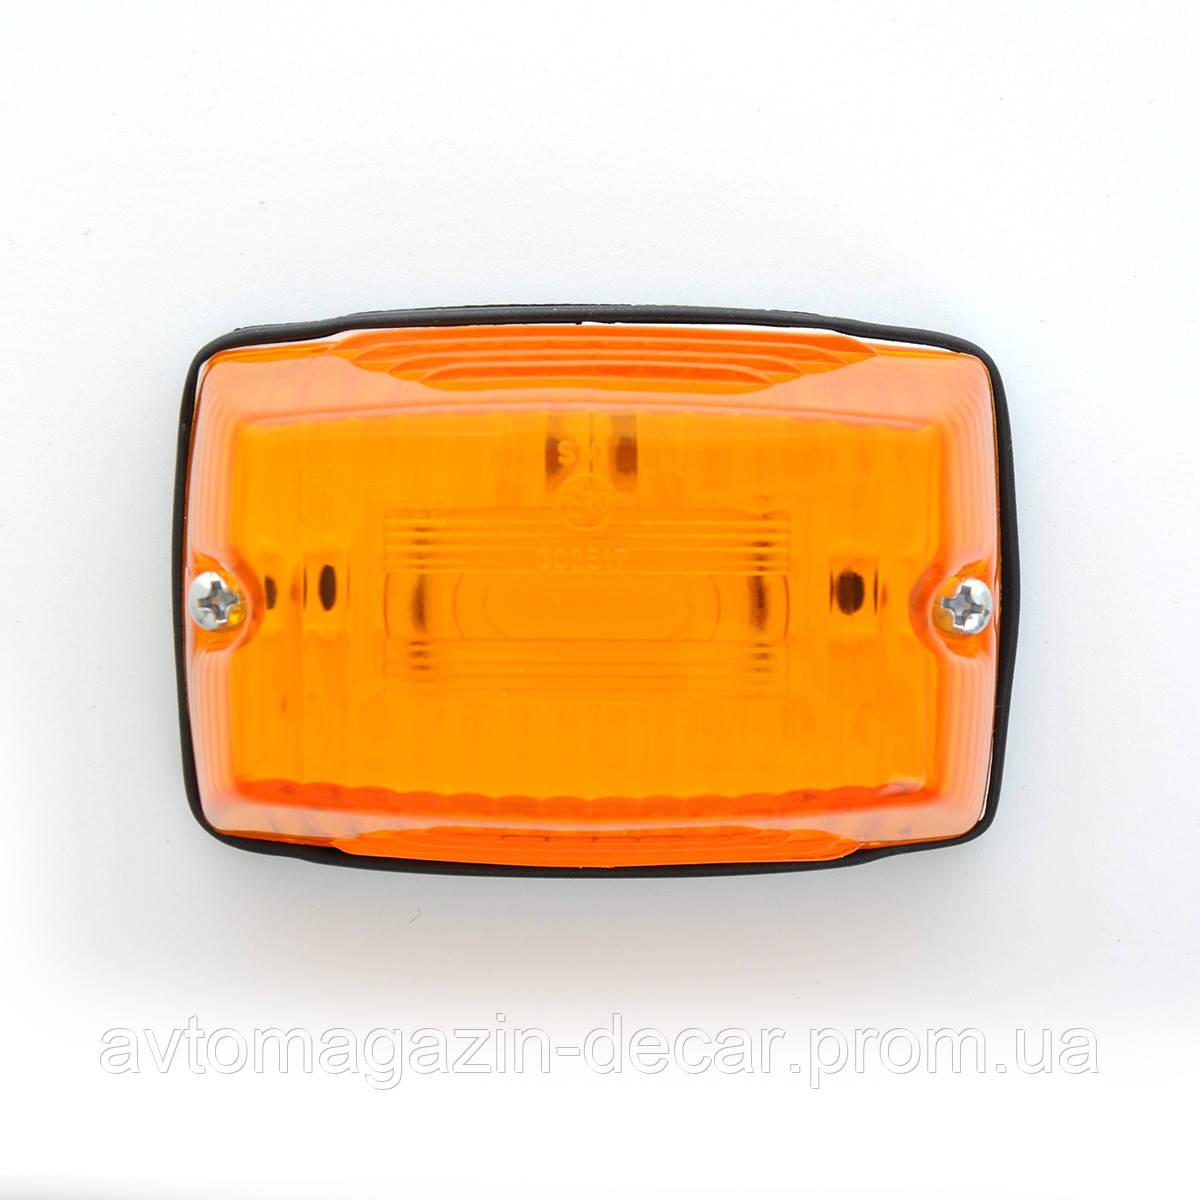 Повтор. поворотов трапеция Fristom FT-006 95х65мм оранжевая (без ламп.)  (1шт)